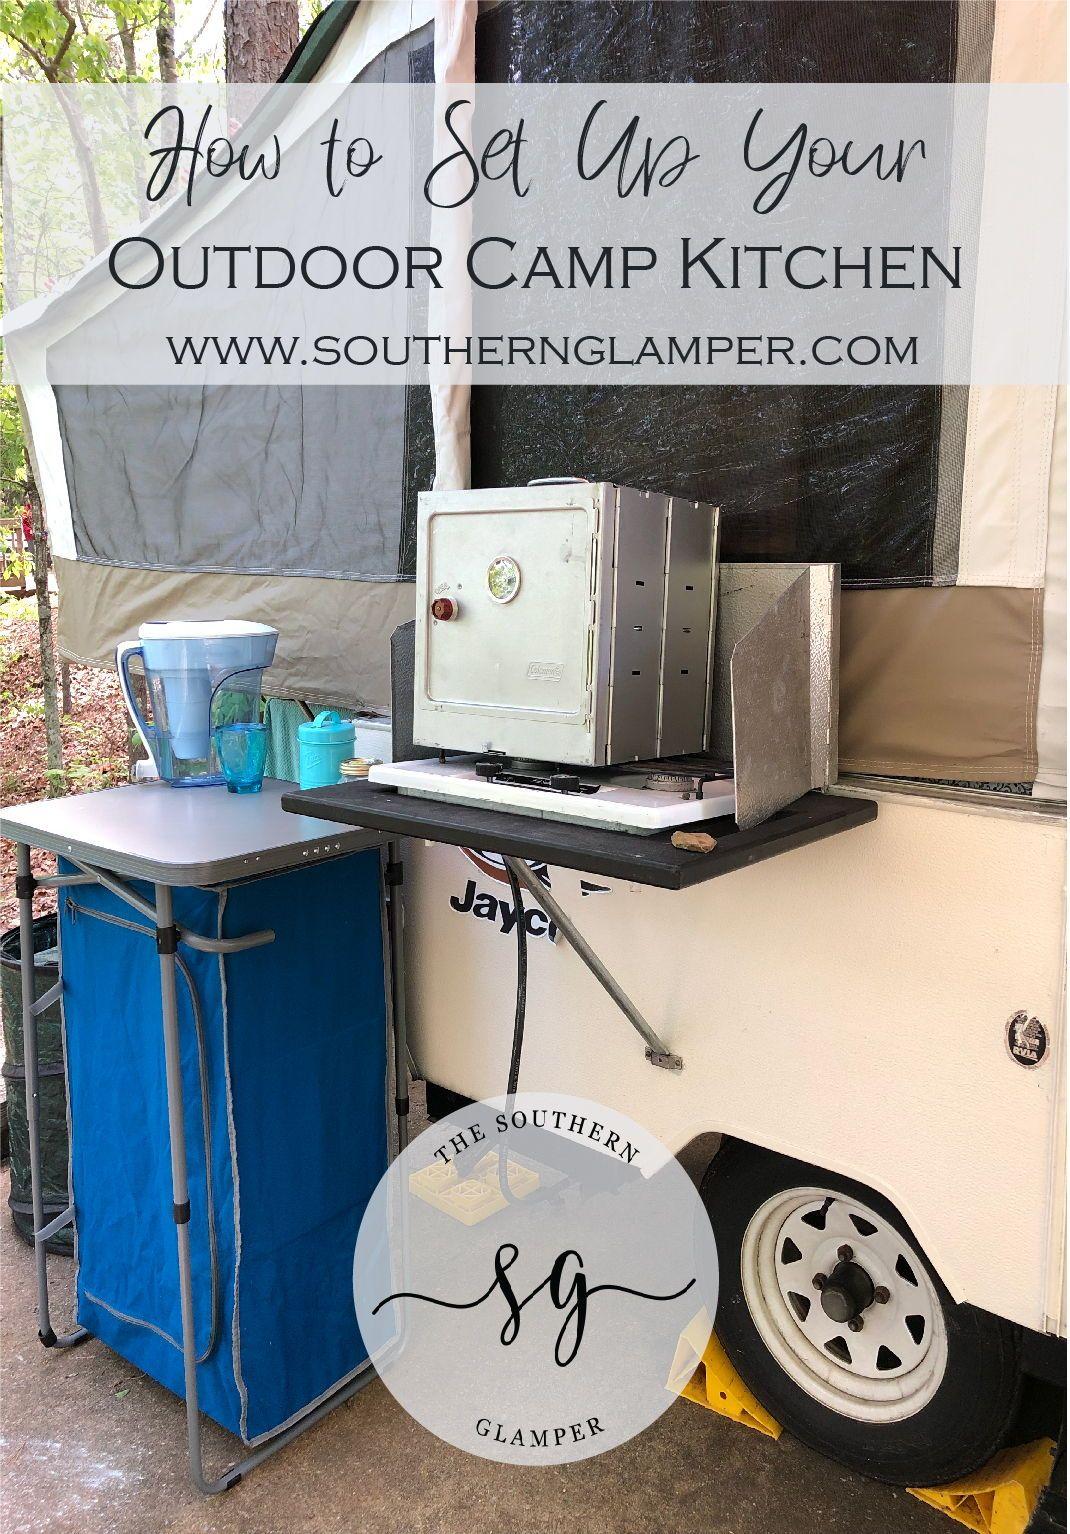 Outside Kitchen Set Up Kitchen Set Up Camping Kitchen Set Up Kitchen Sets